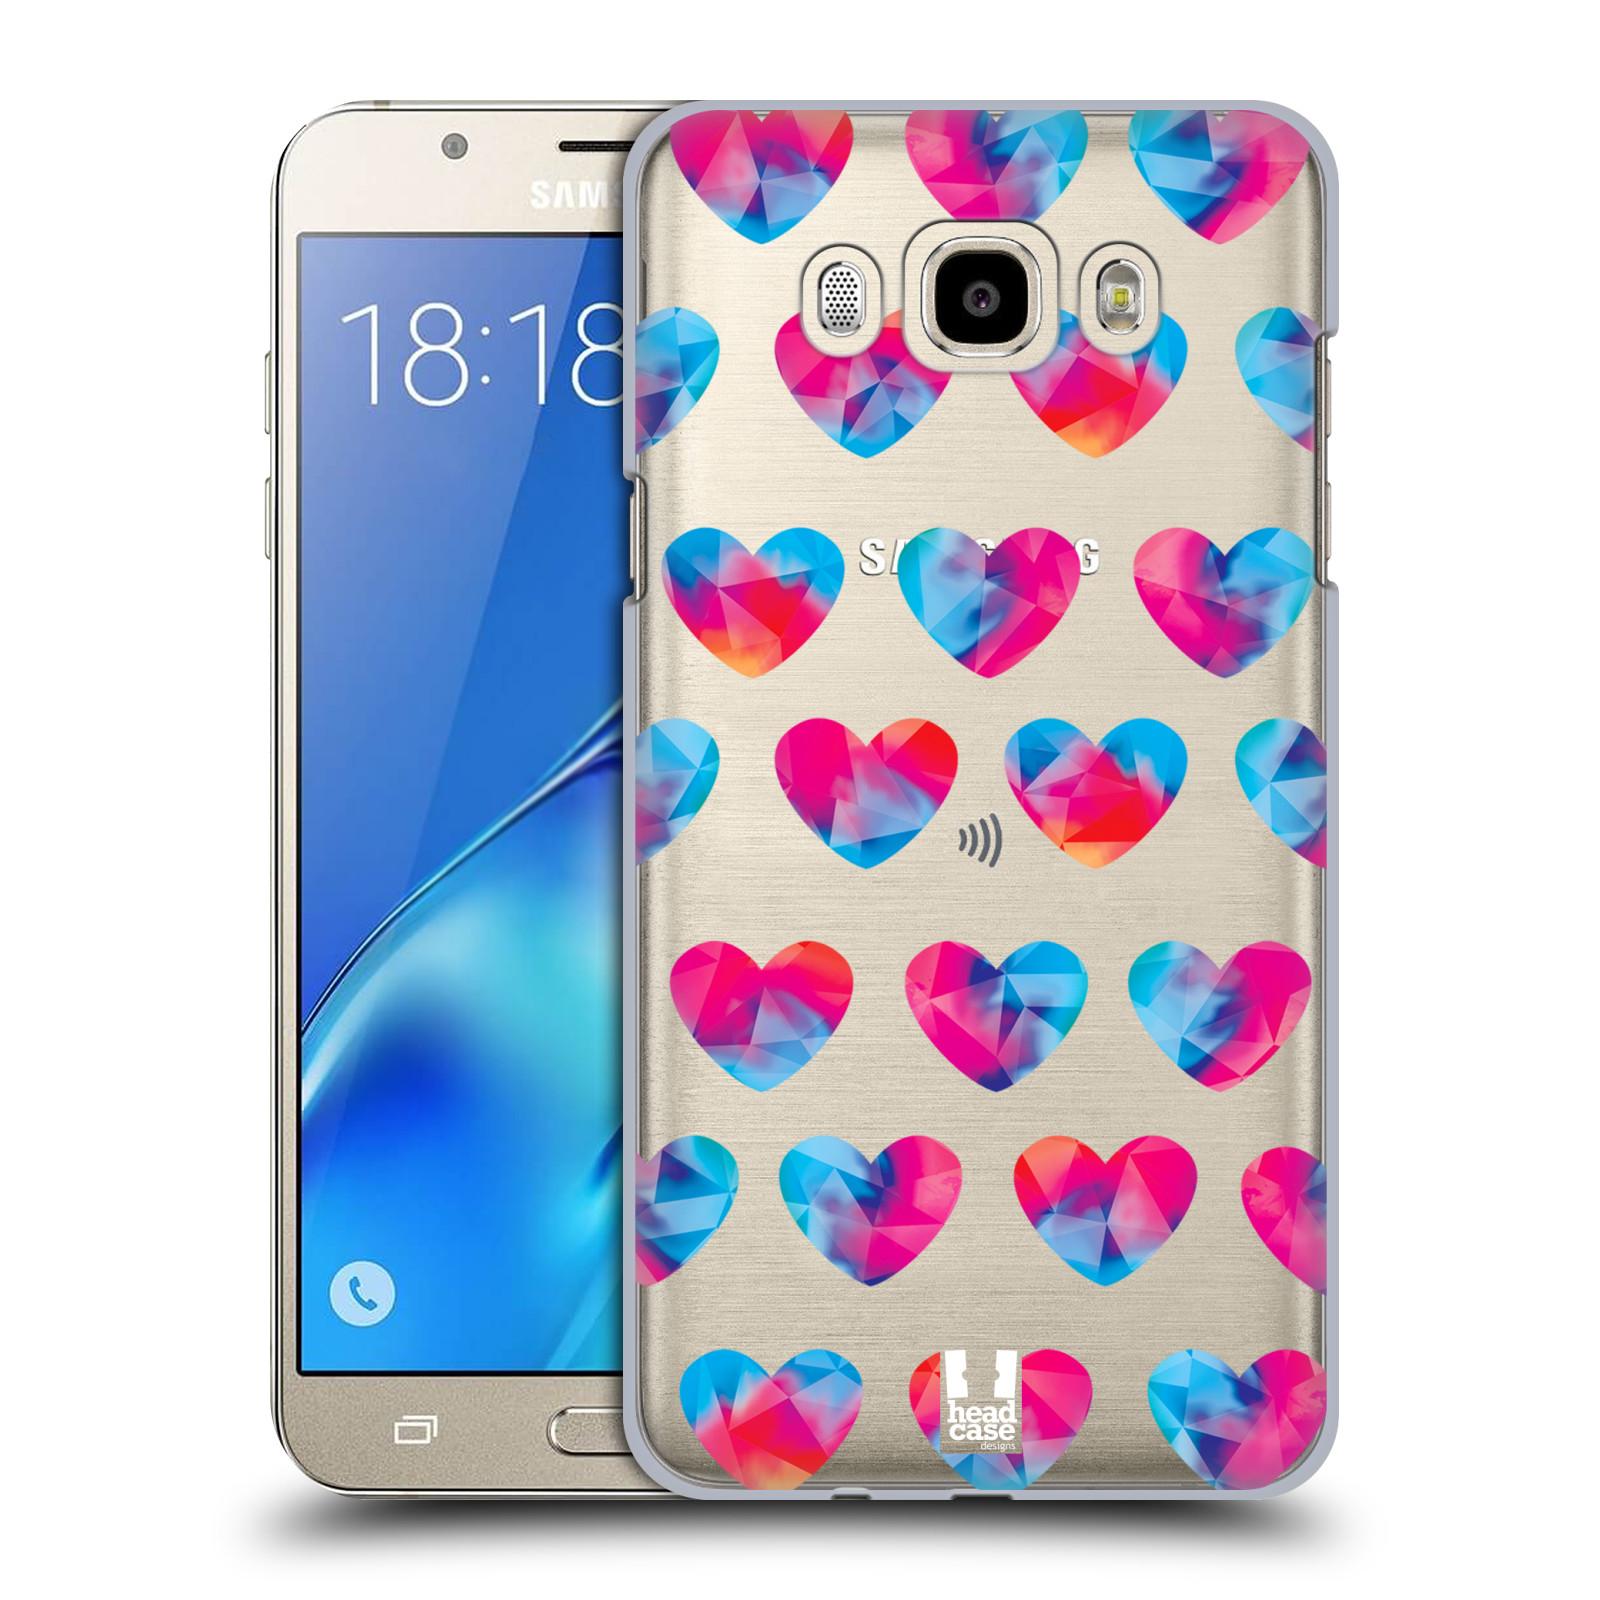 Plastové pouzdro na mobil Samsung Galaxy J7 (2016) - Head Case - Srdíčka hrající barvami